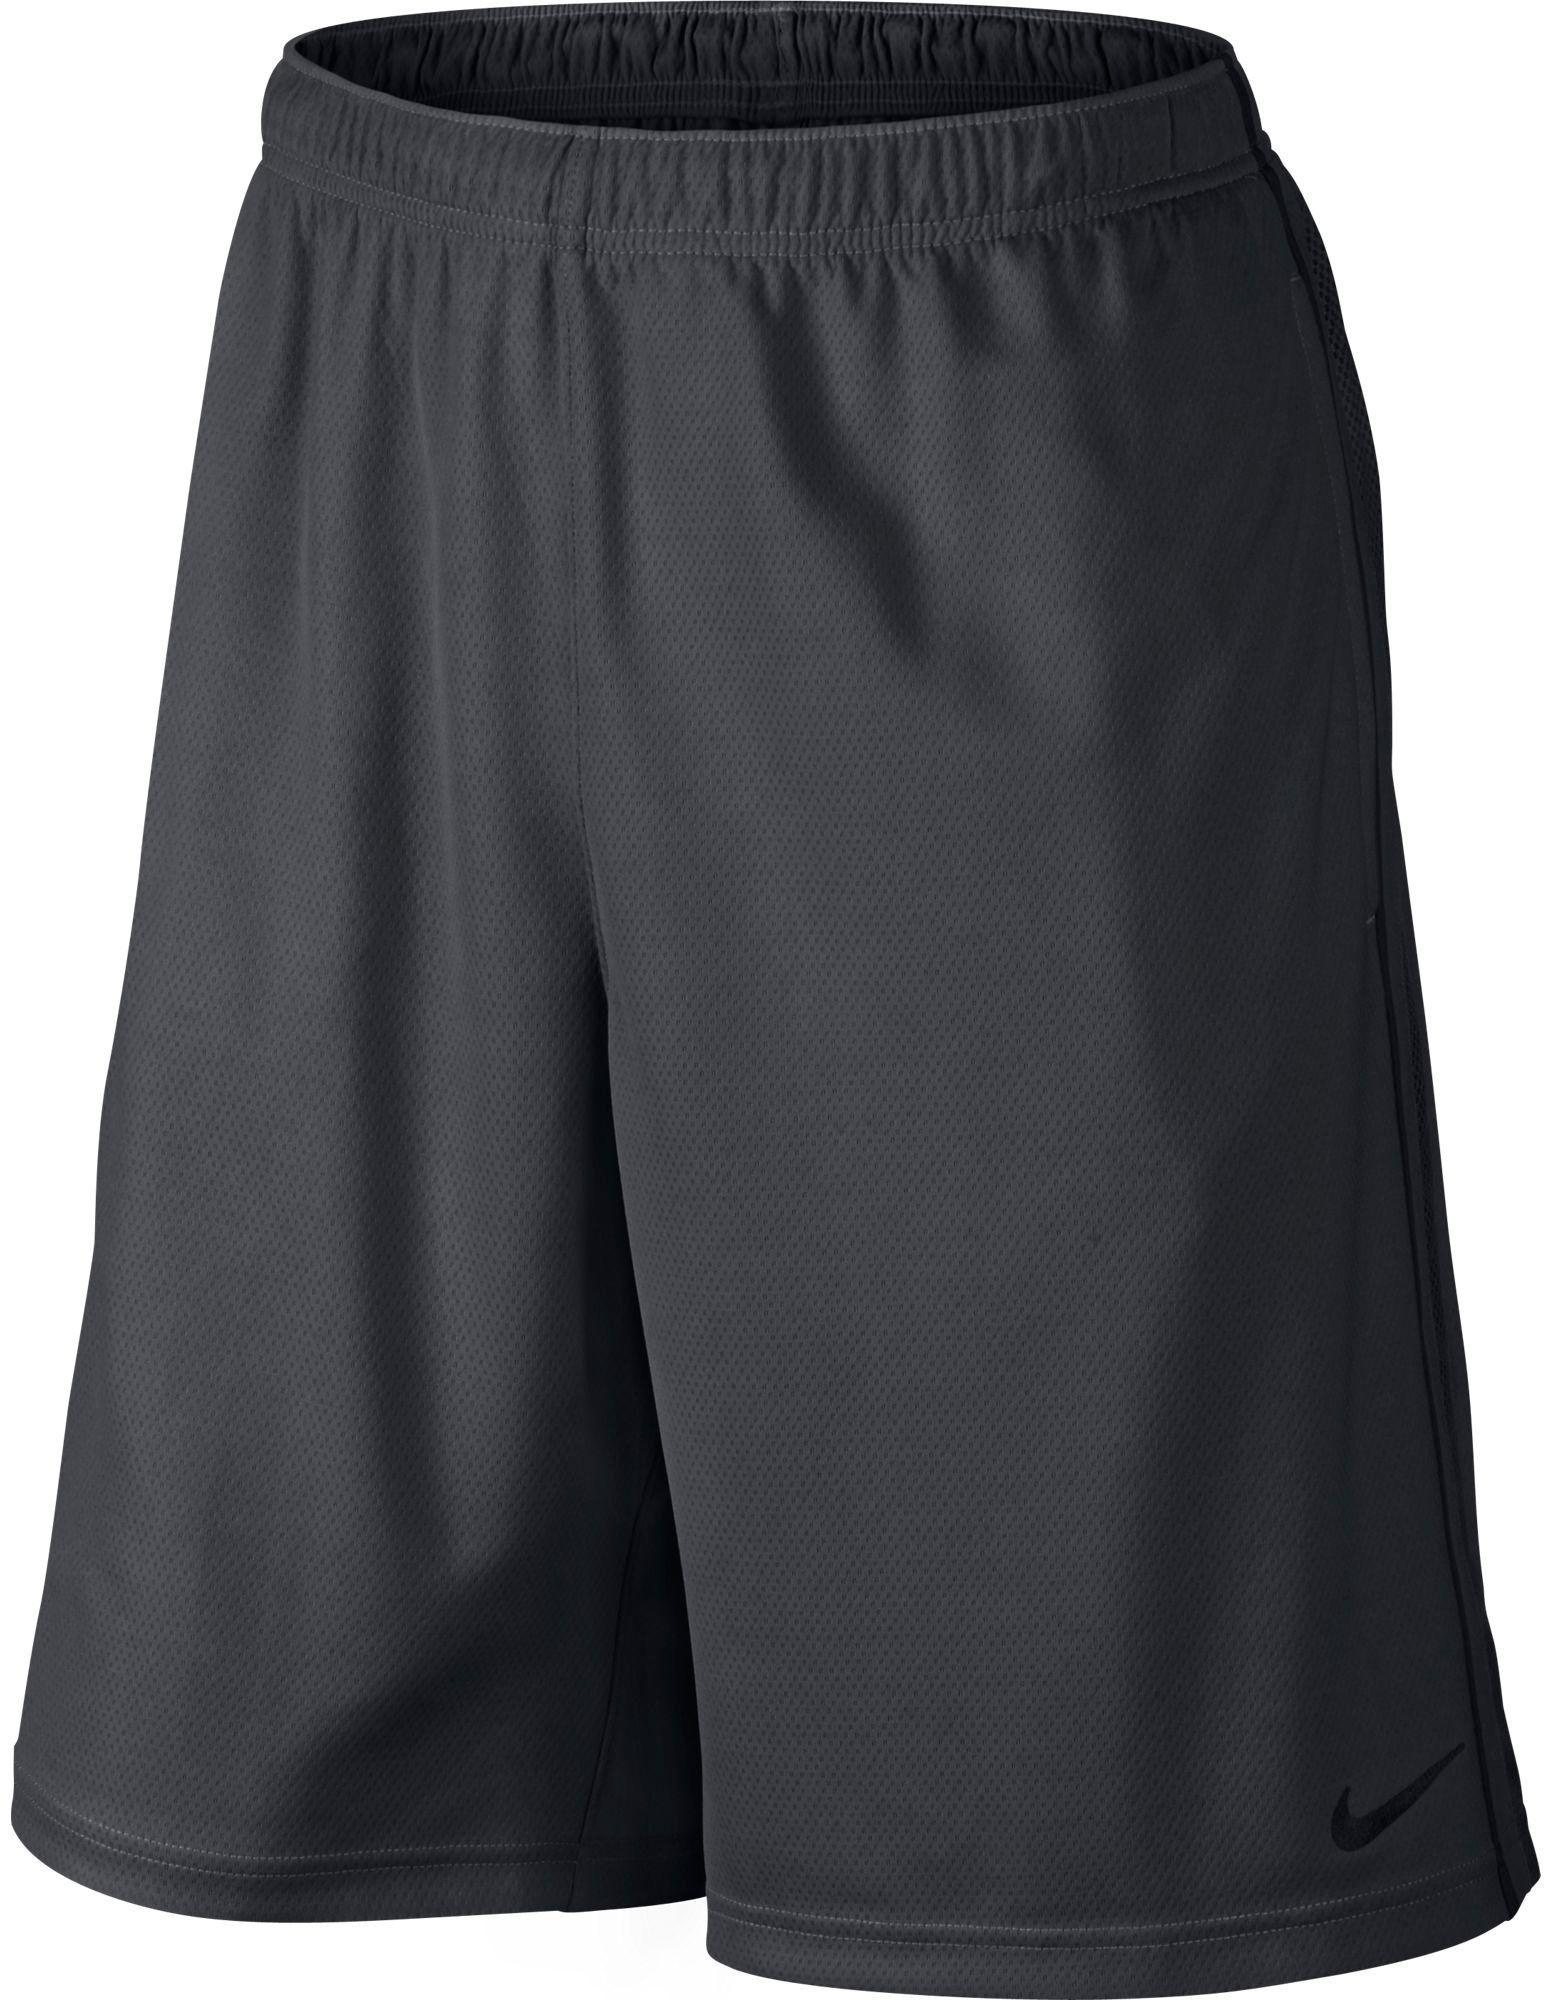 Nike Short Mens